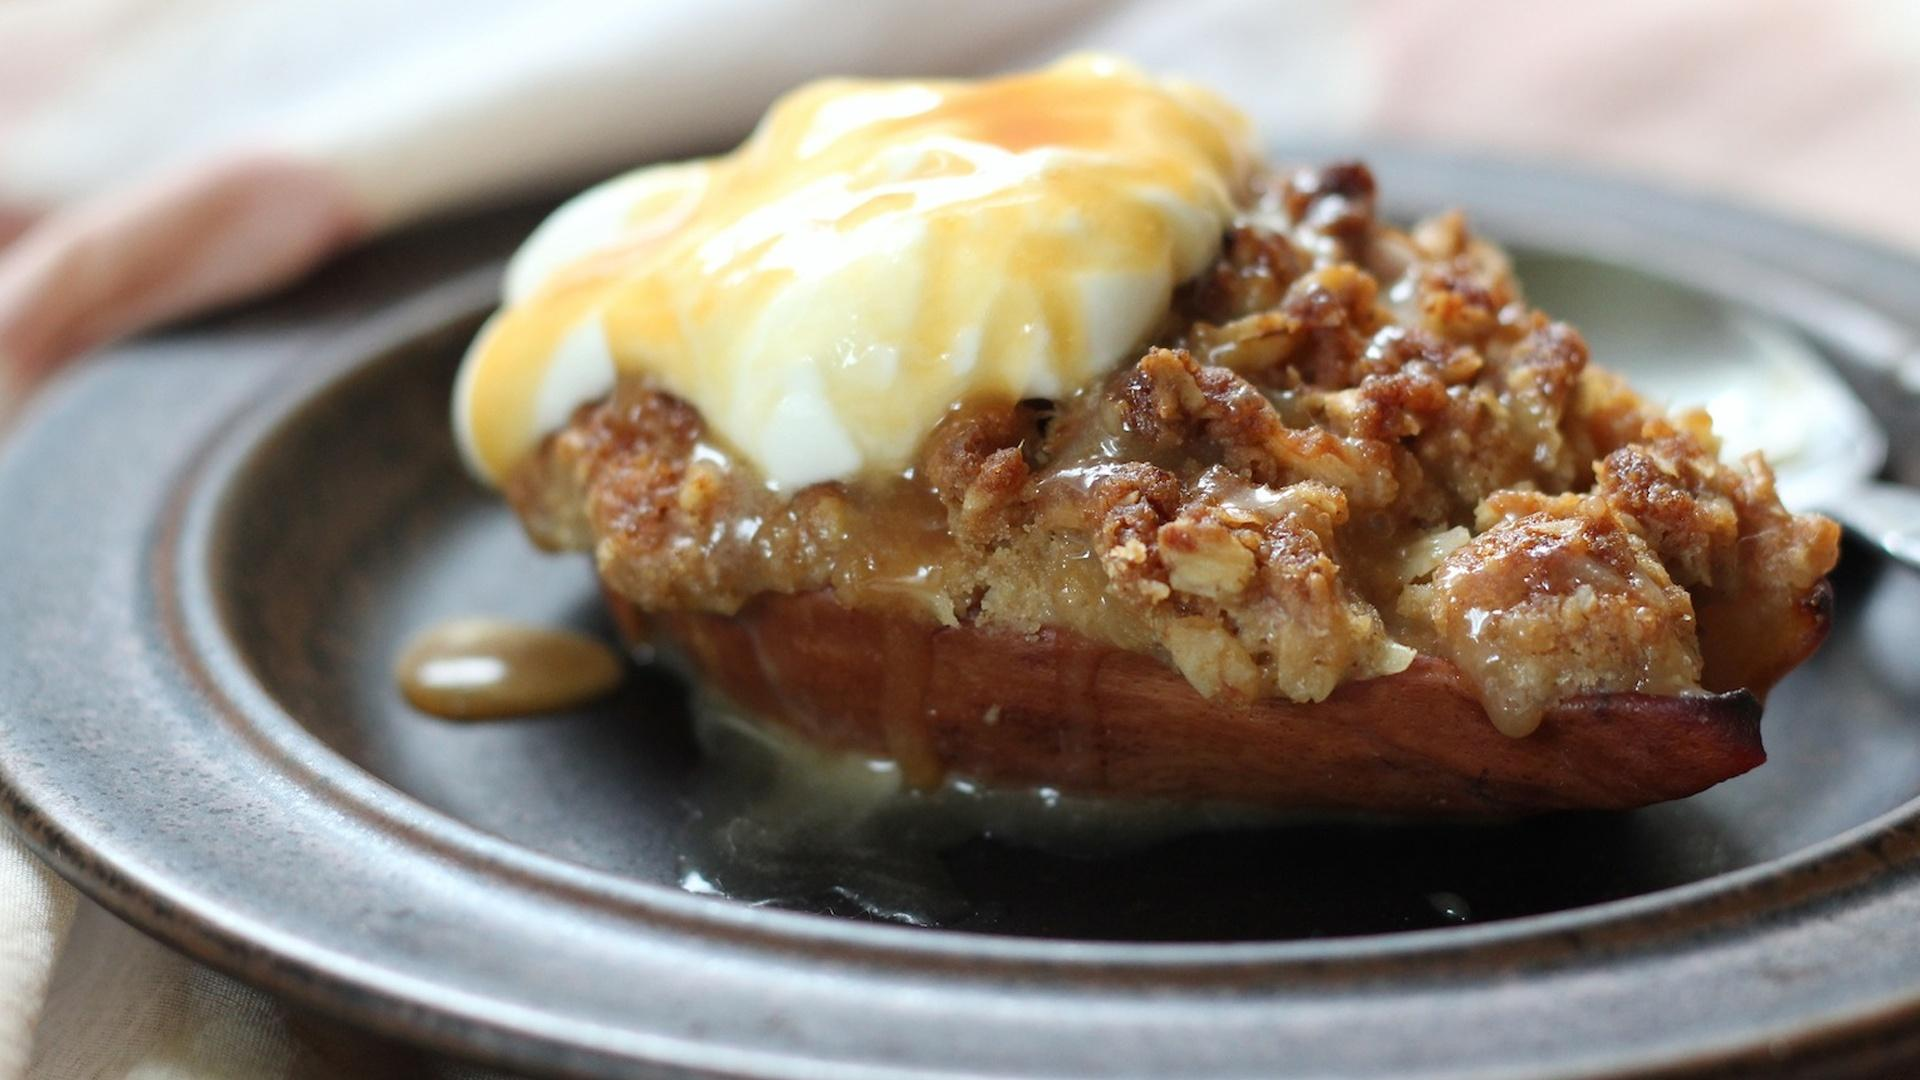 S1 Ep9: Pear Crisp with Salted Bourbon Caramel